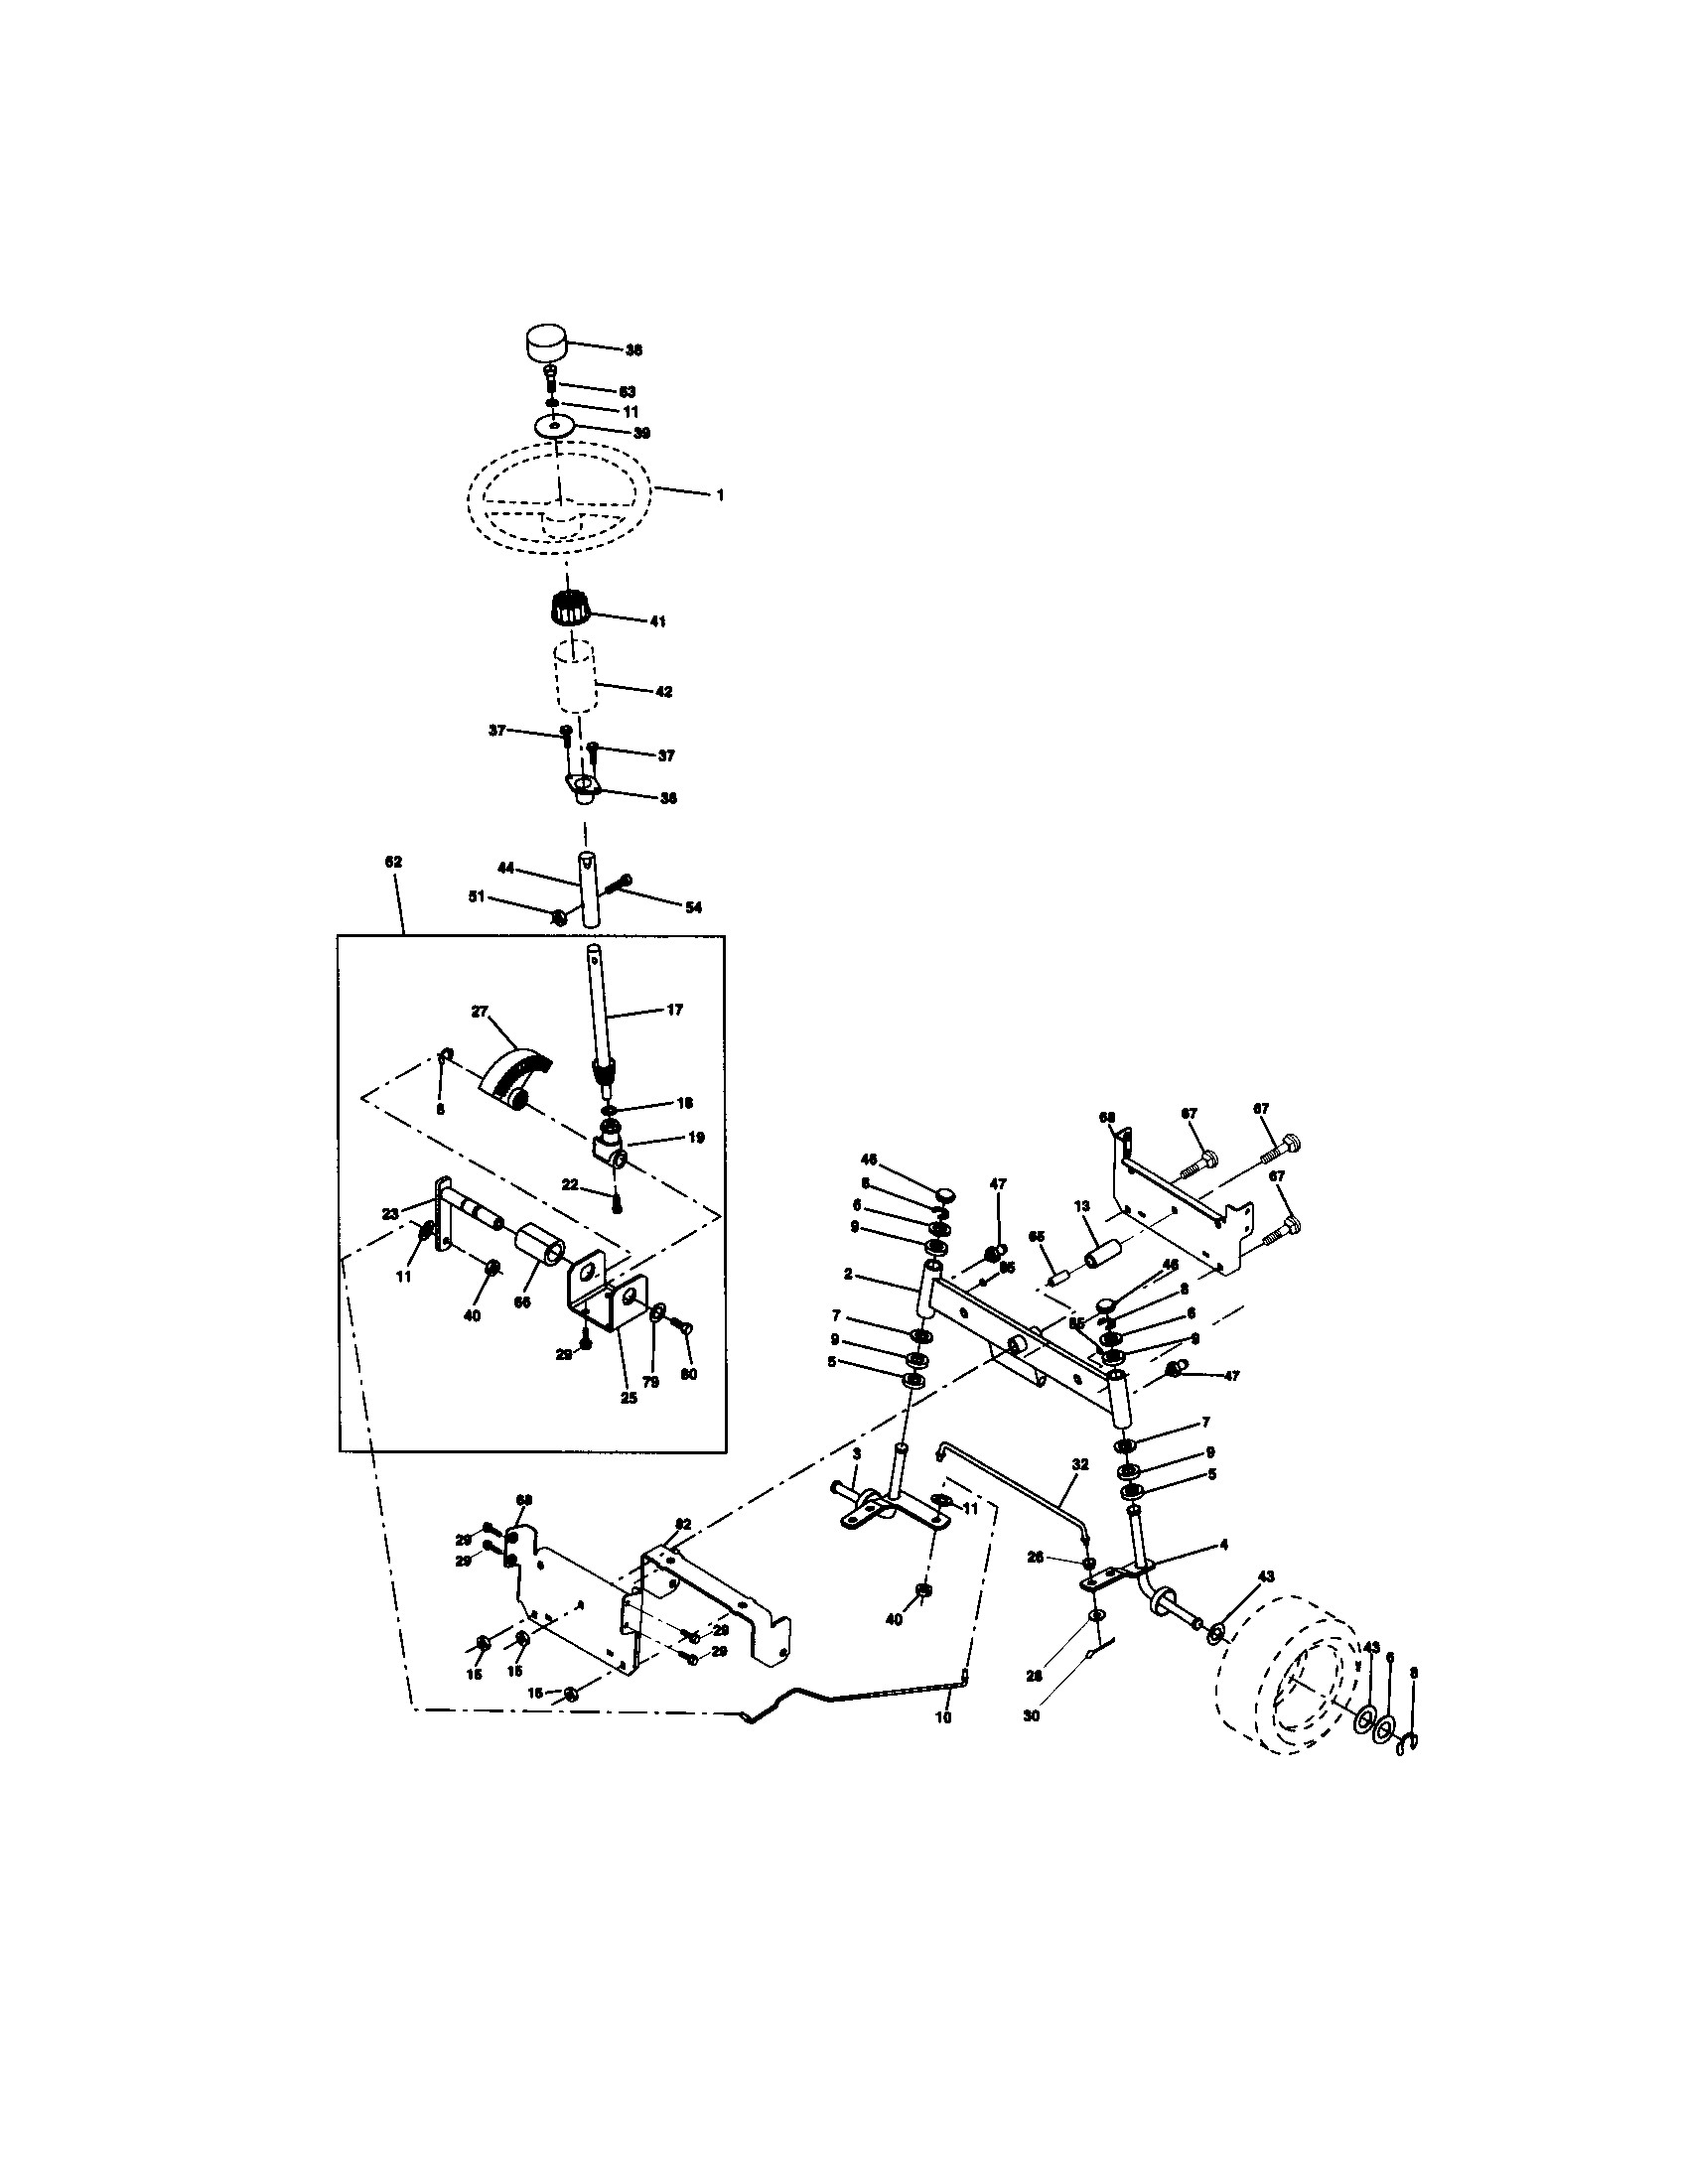 Craftsman Ltx 1000 Parts Diagram Looking for Craftsman Model Repair & Replacement Parts Of Craftsman Ltx 1000 Parts Diagram